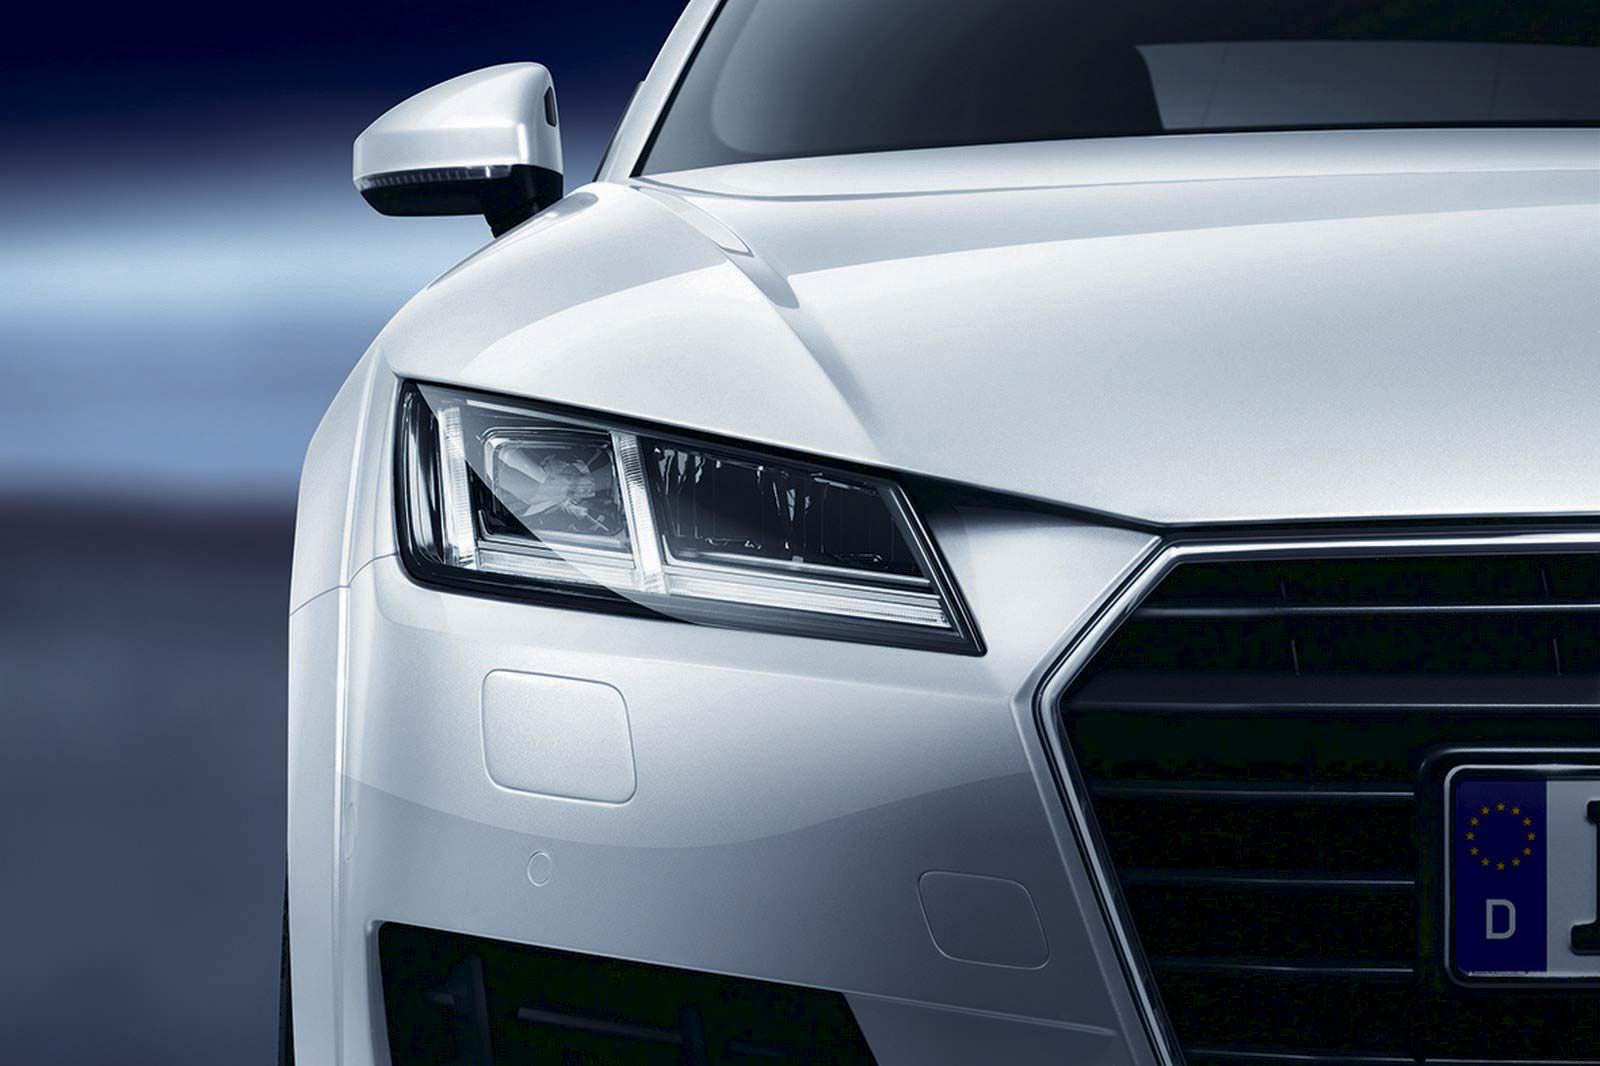 Светодиодные фары Audi TT 1.8 Lighting Style Edition